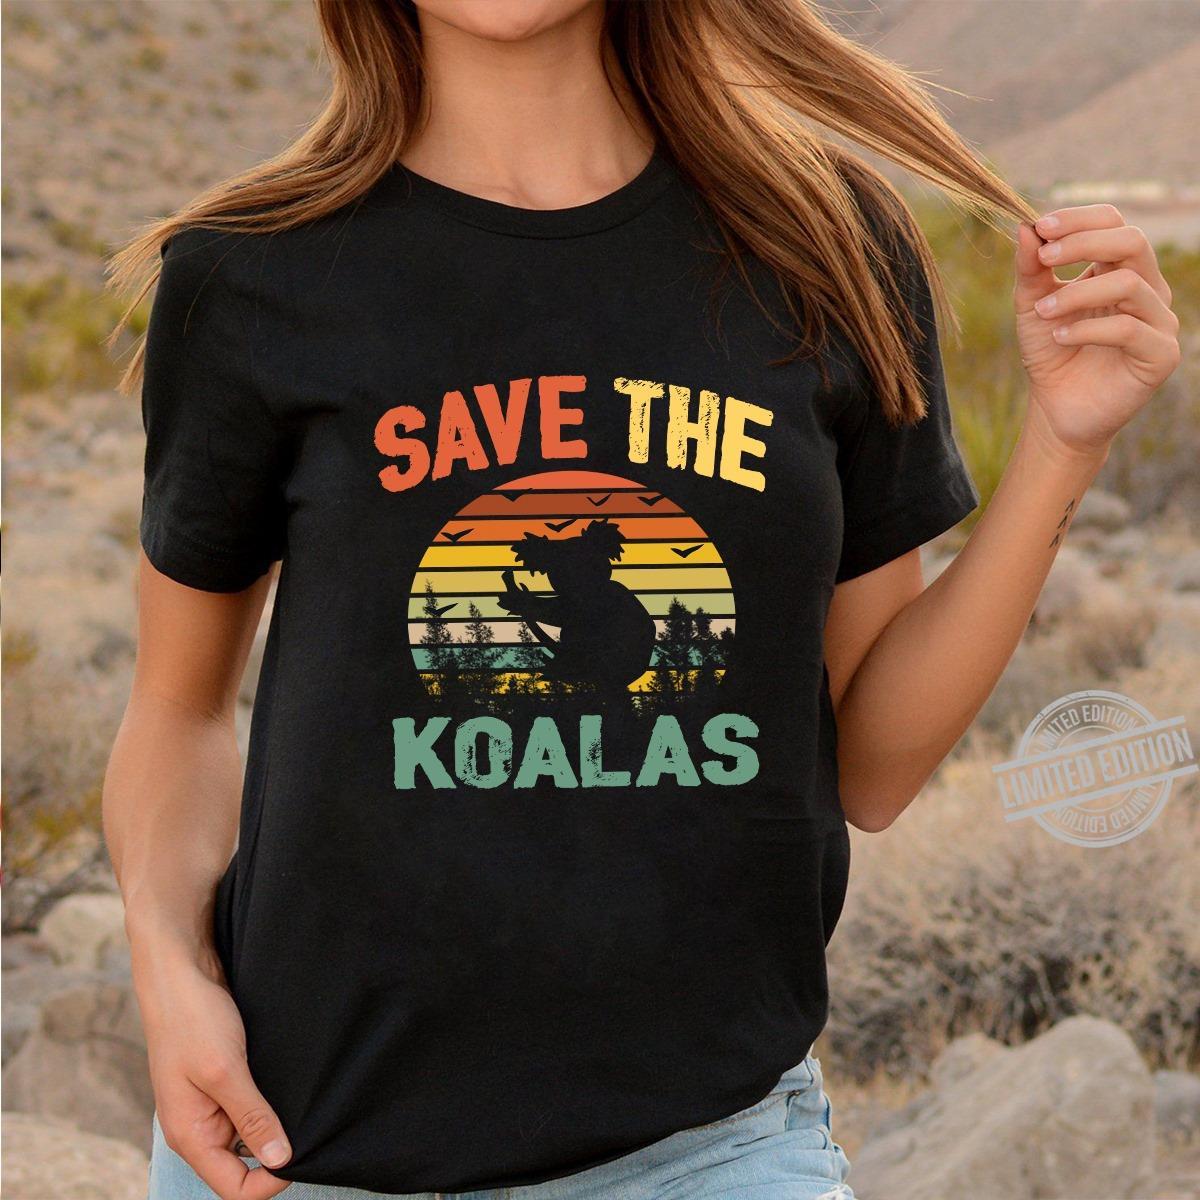 Awesome VintageSave The Koalas Shirt